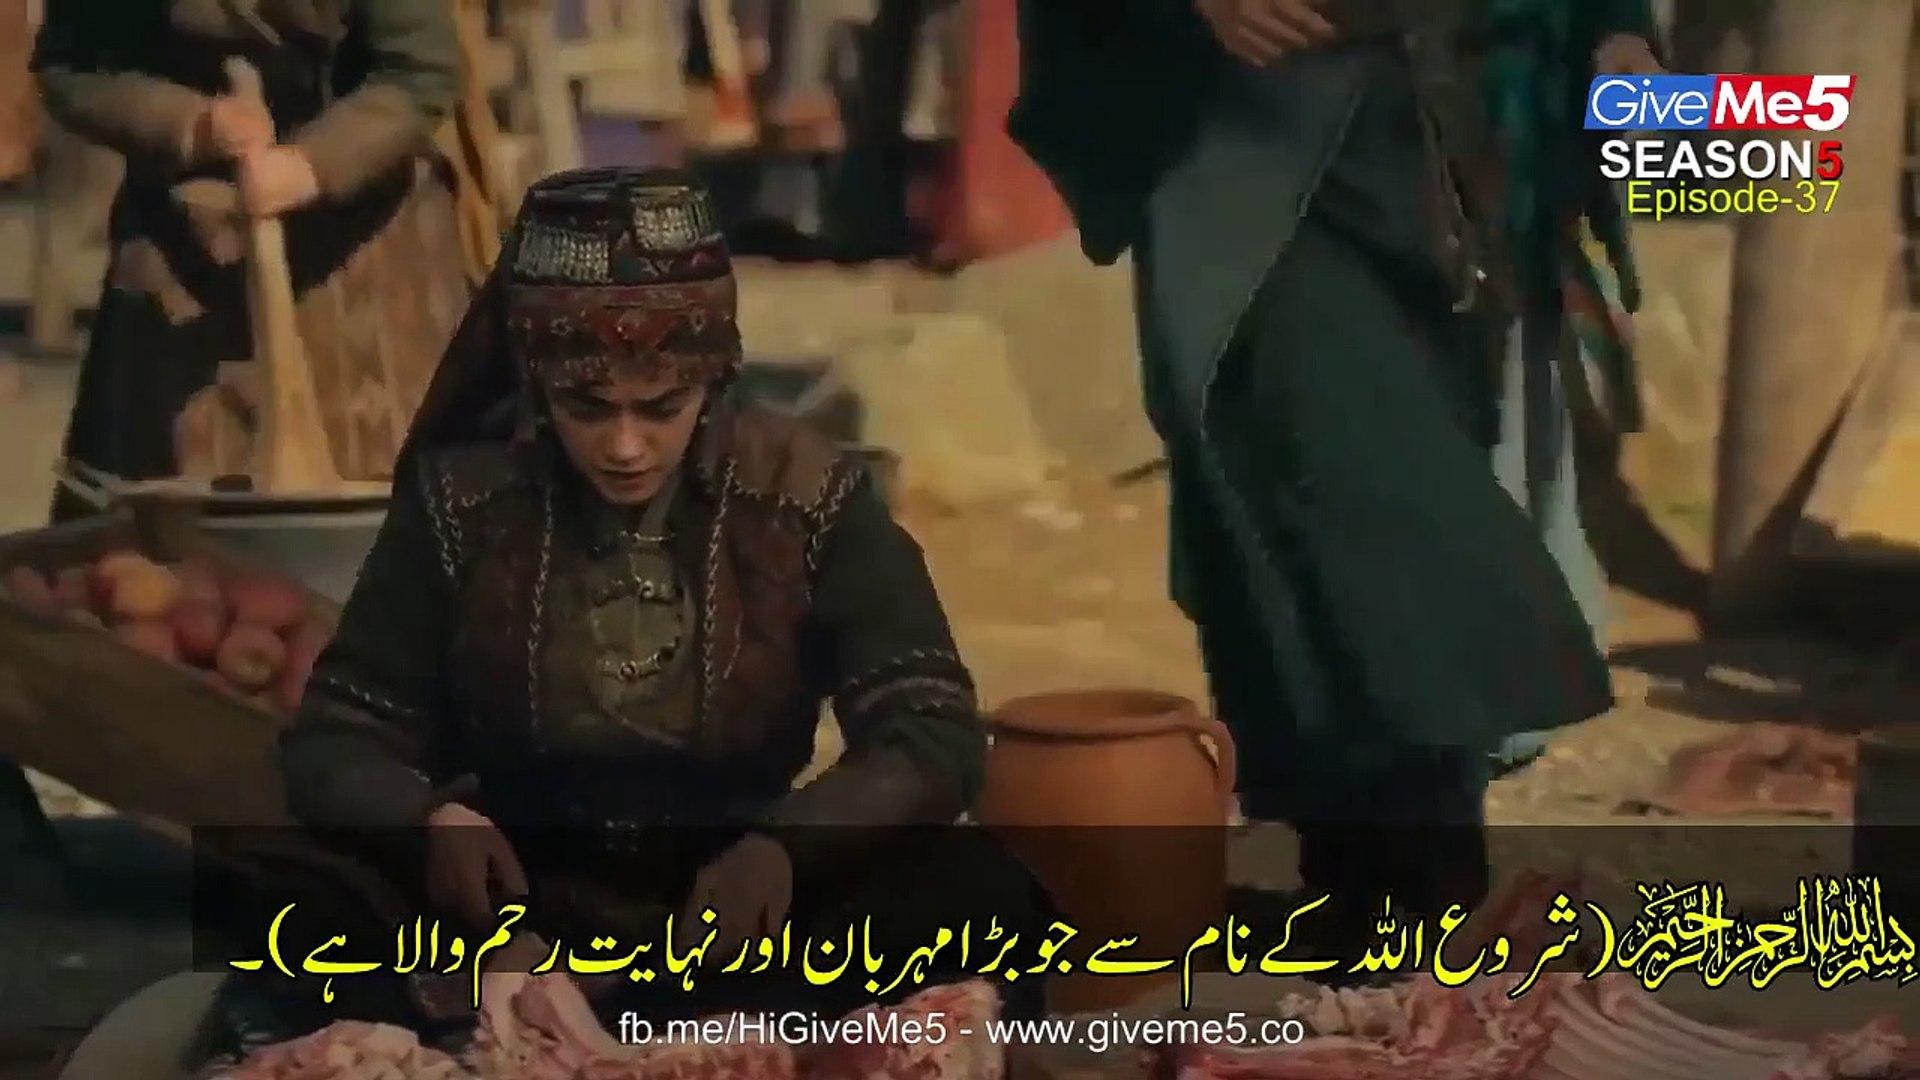 Dirilis Ertugrul Ghazi Season 5 in Urdu Subtitle Episode 37 & 38